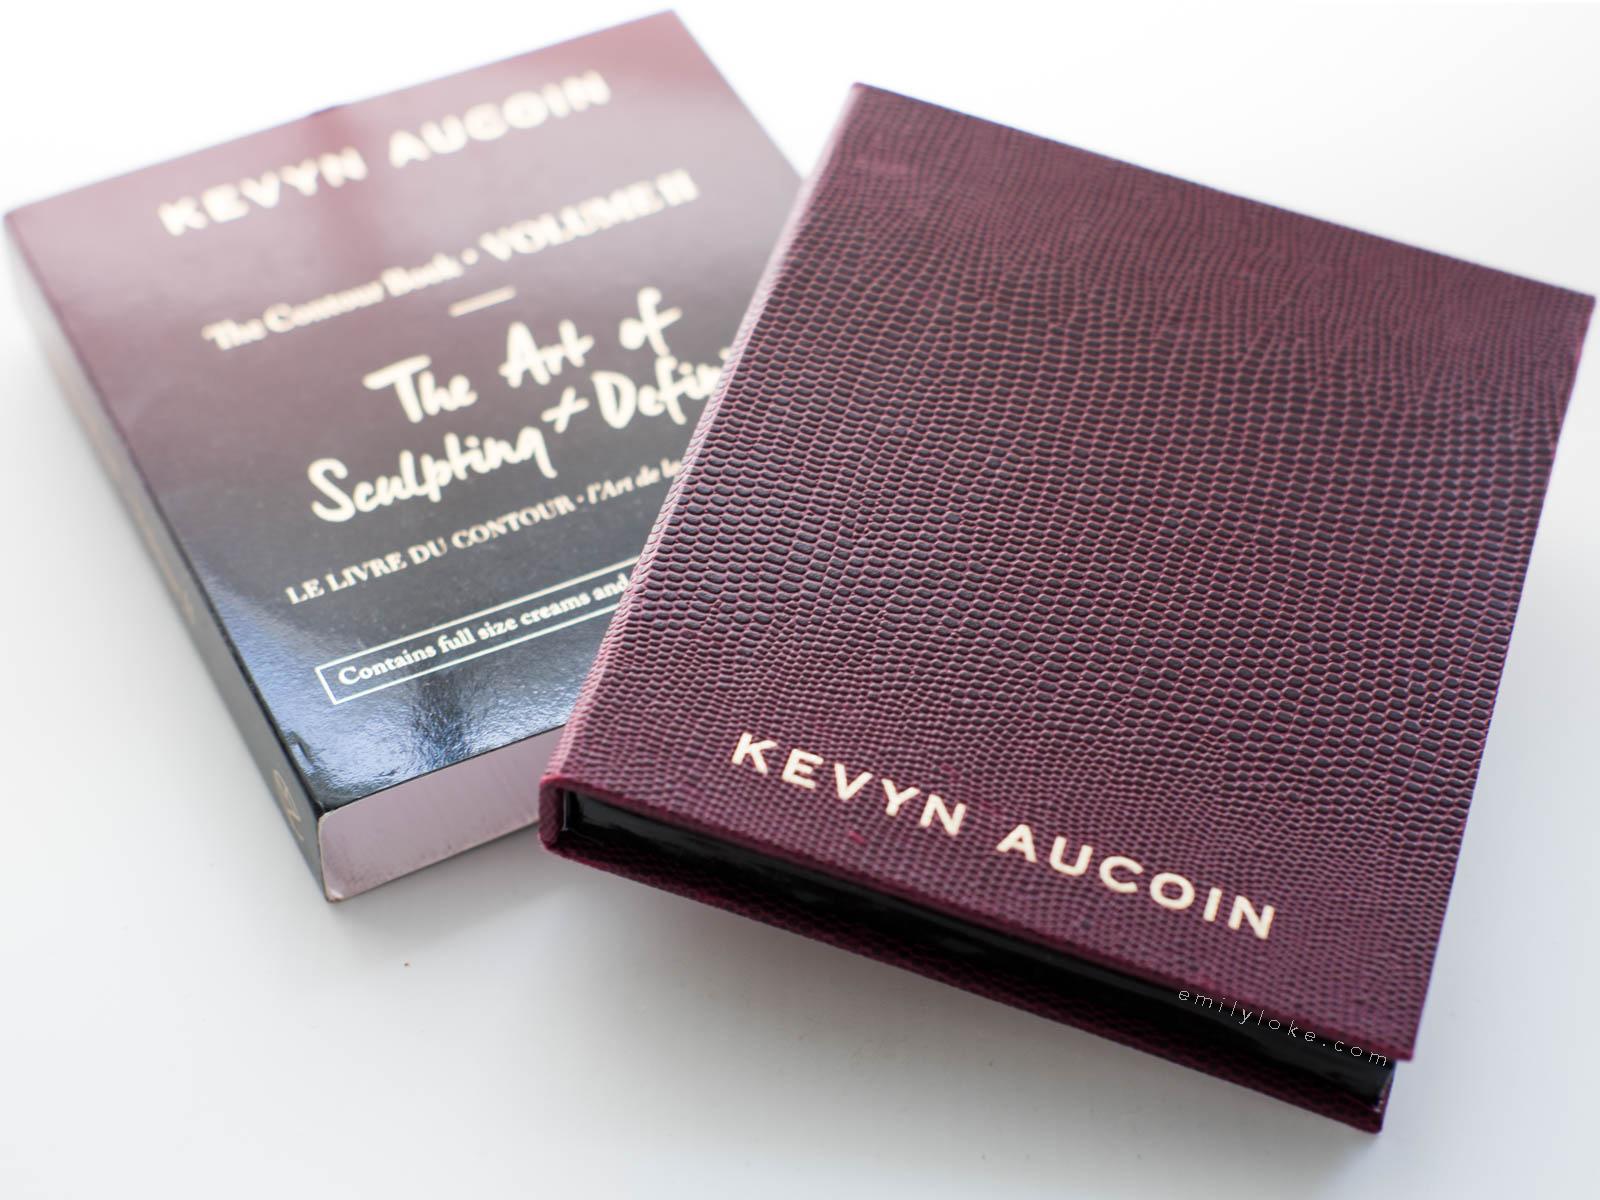 Kevyn Aucoin Contour Book 1